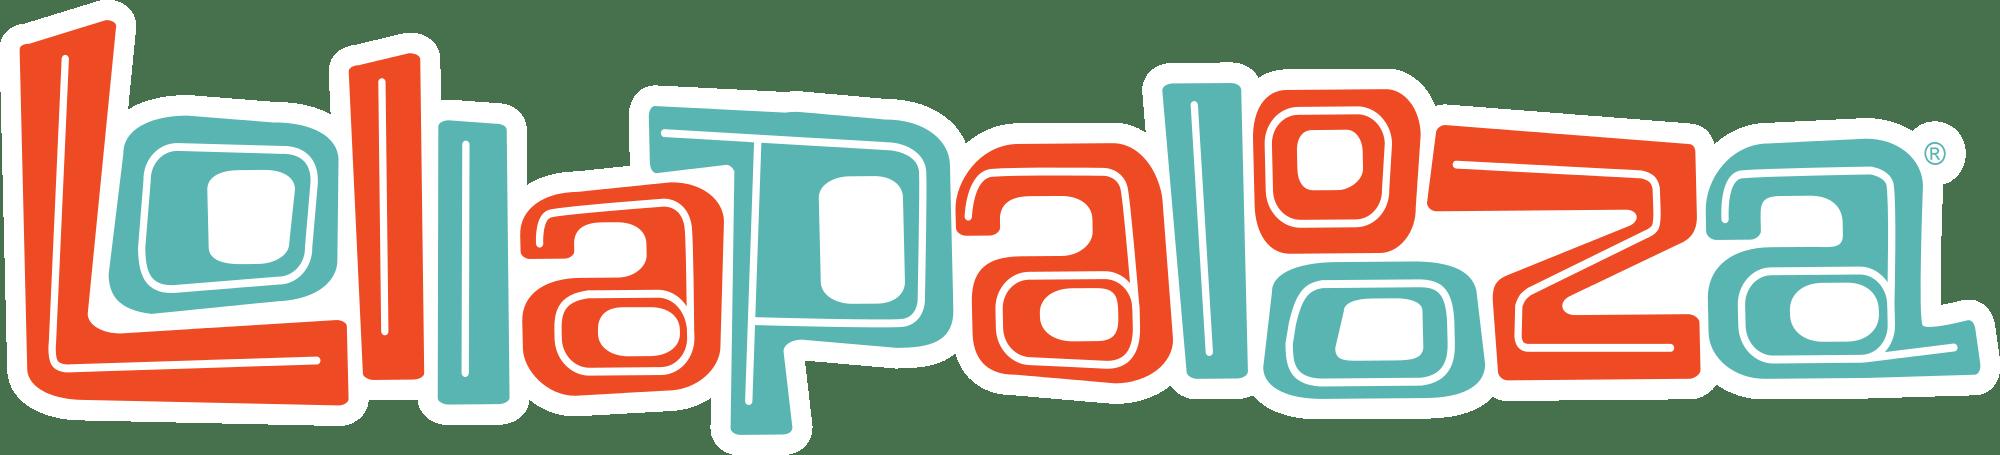 Lollapalooza logo clipart free stock Lollapalooza Logo transparent PNG - StickPNG free stock